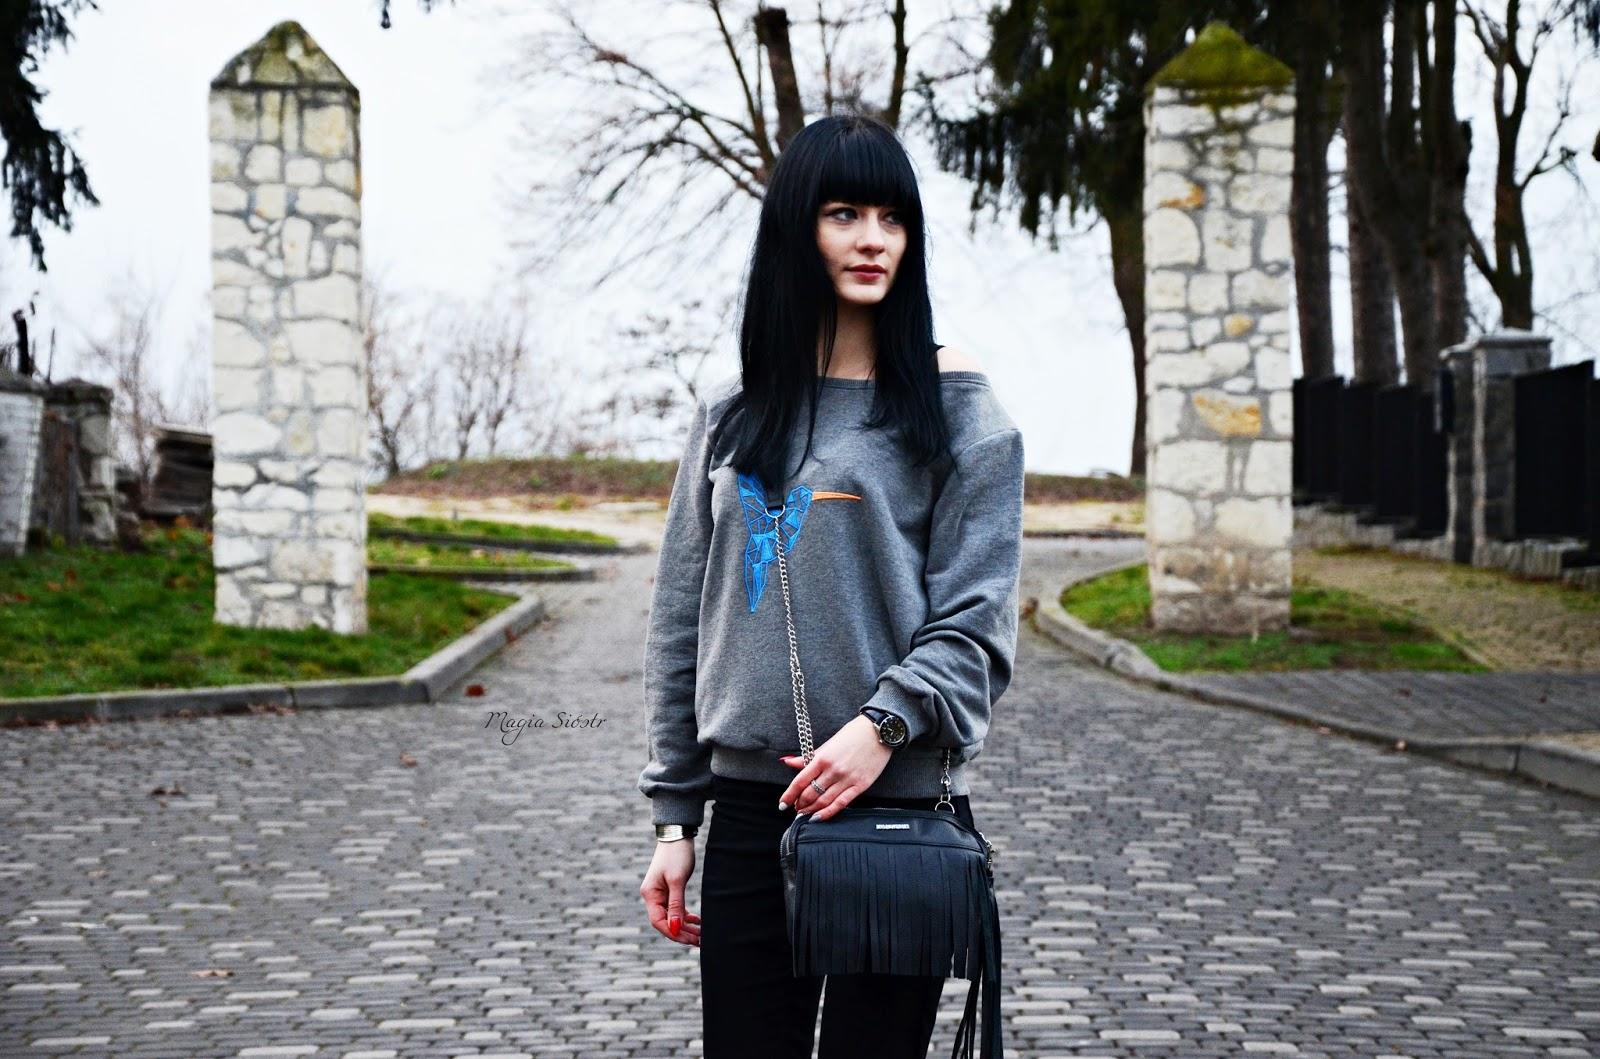 Fabiola torebki, torebka skórzana, torebka z frędzlami, mała czarna, czarna torebka, torebka na łańcuszku